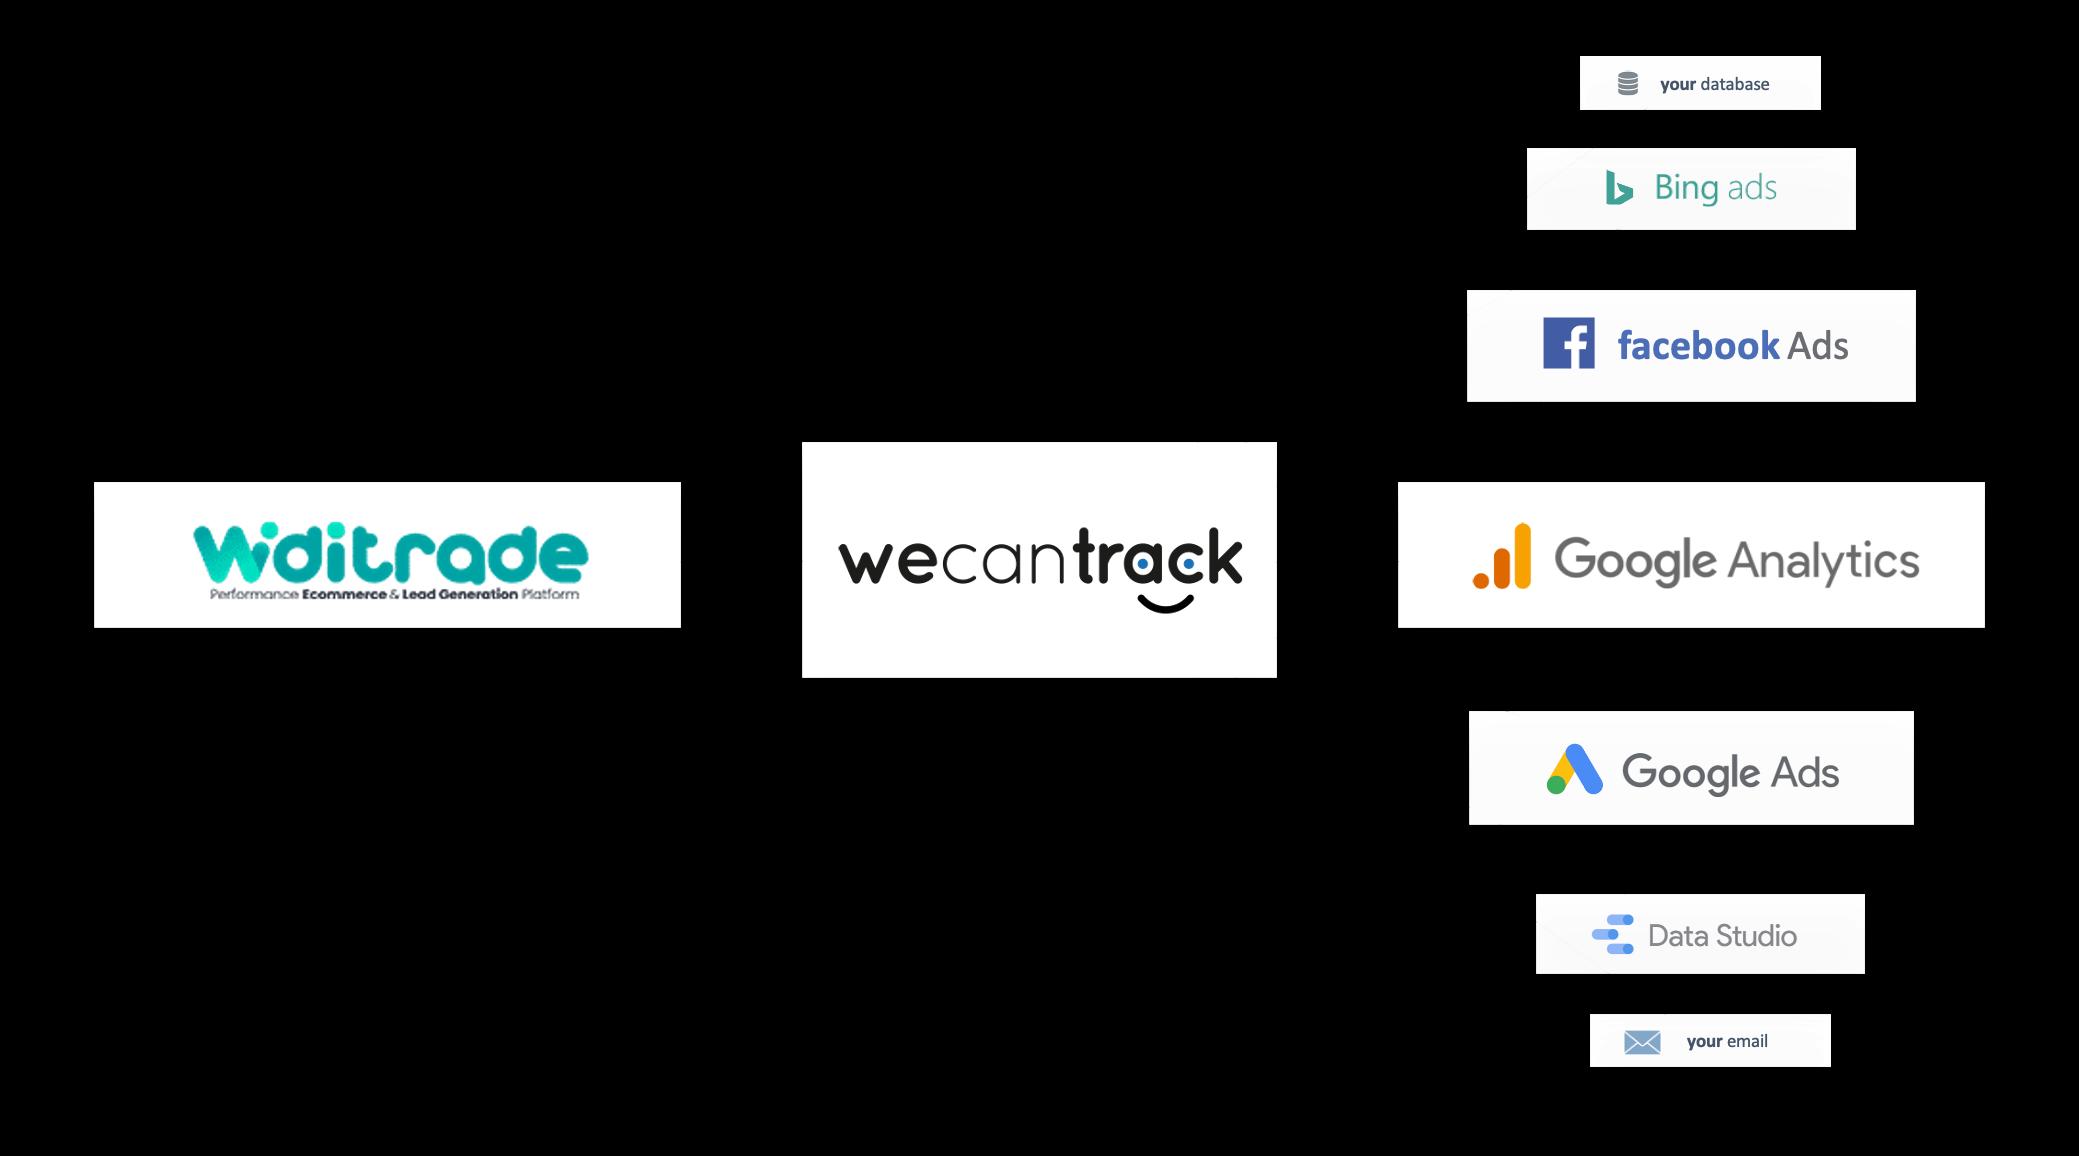 integrate-widitrade-affiliate-conversions-via-postback-